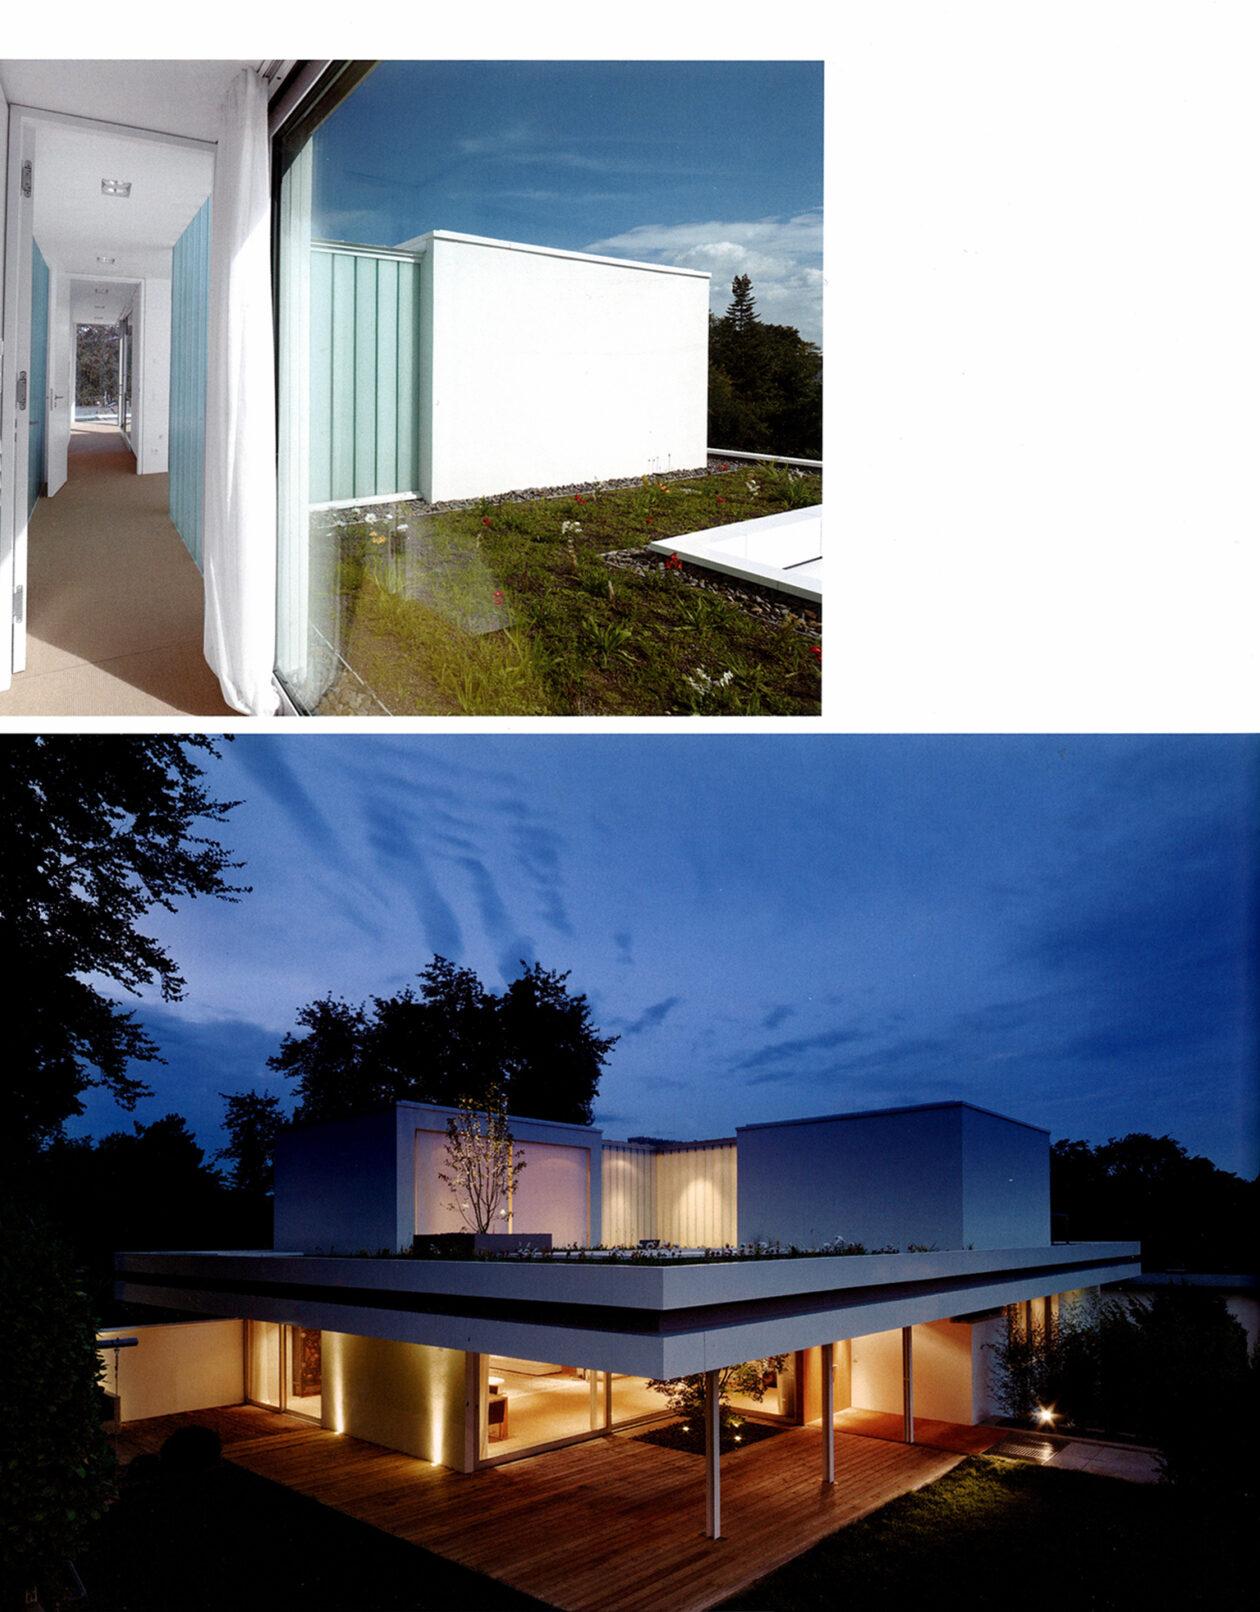 Landscape Architecture 06